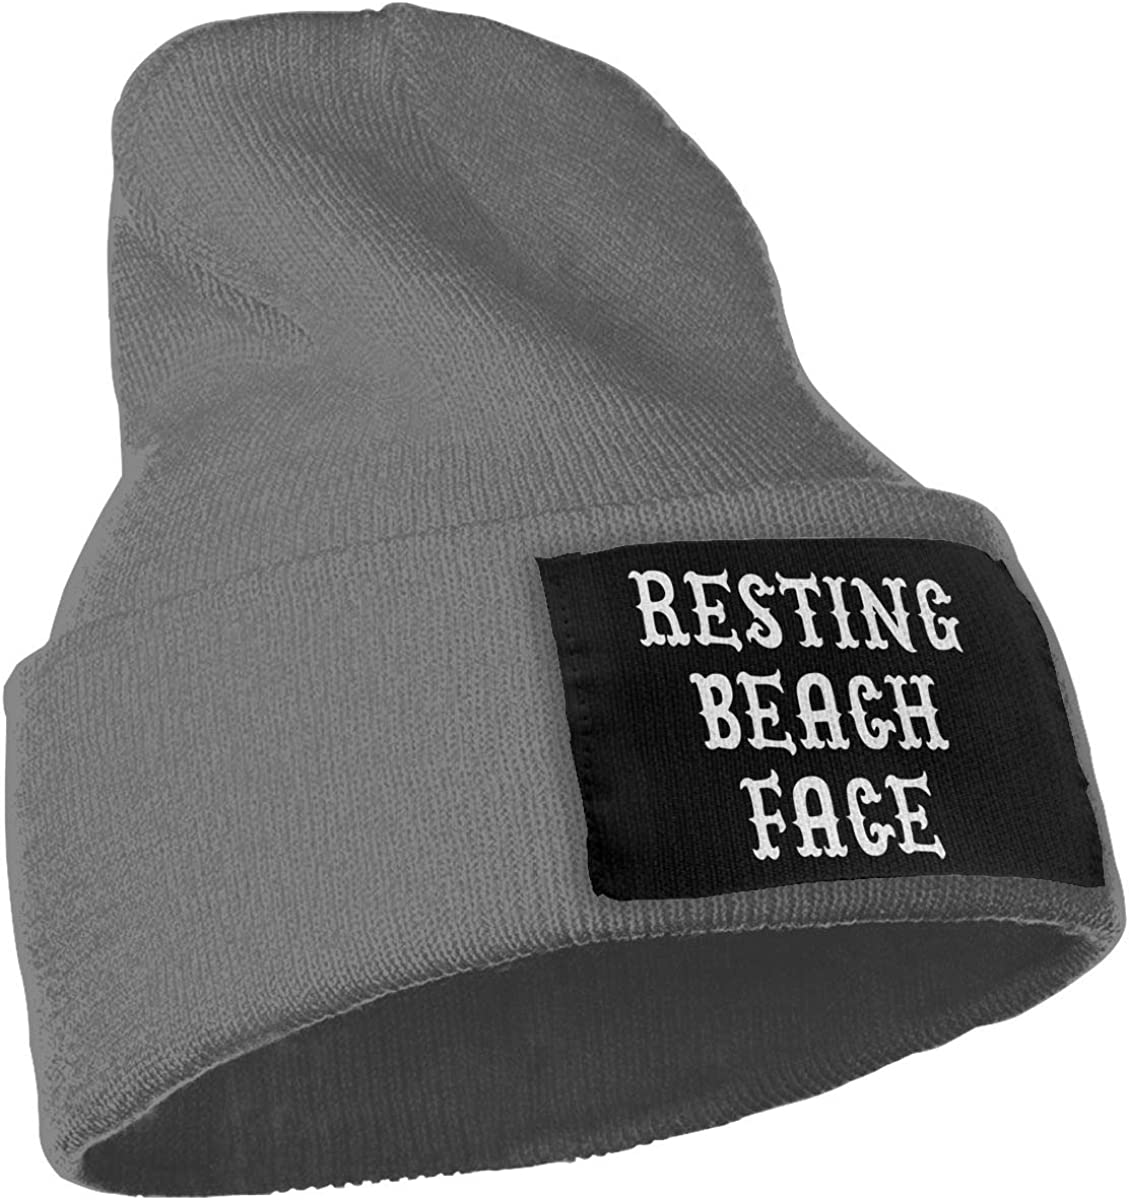 COLLJL-8 Men//Women Resting Beach Face Outdoor Warm Knit Beanies Hat Soft Winter Skull Caps